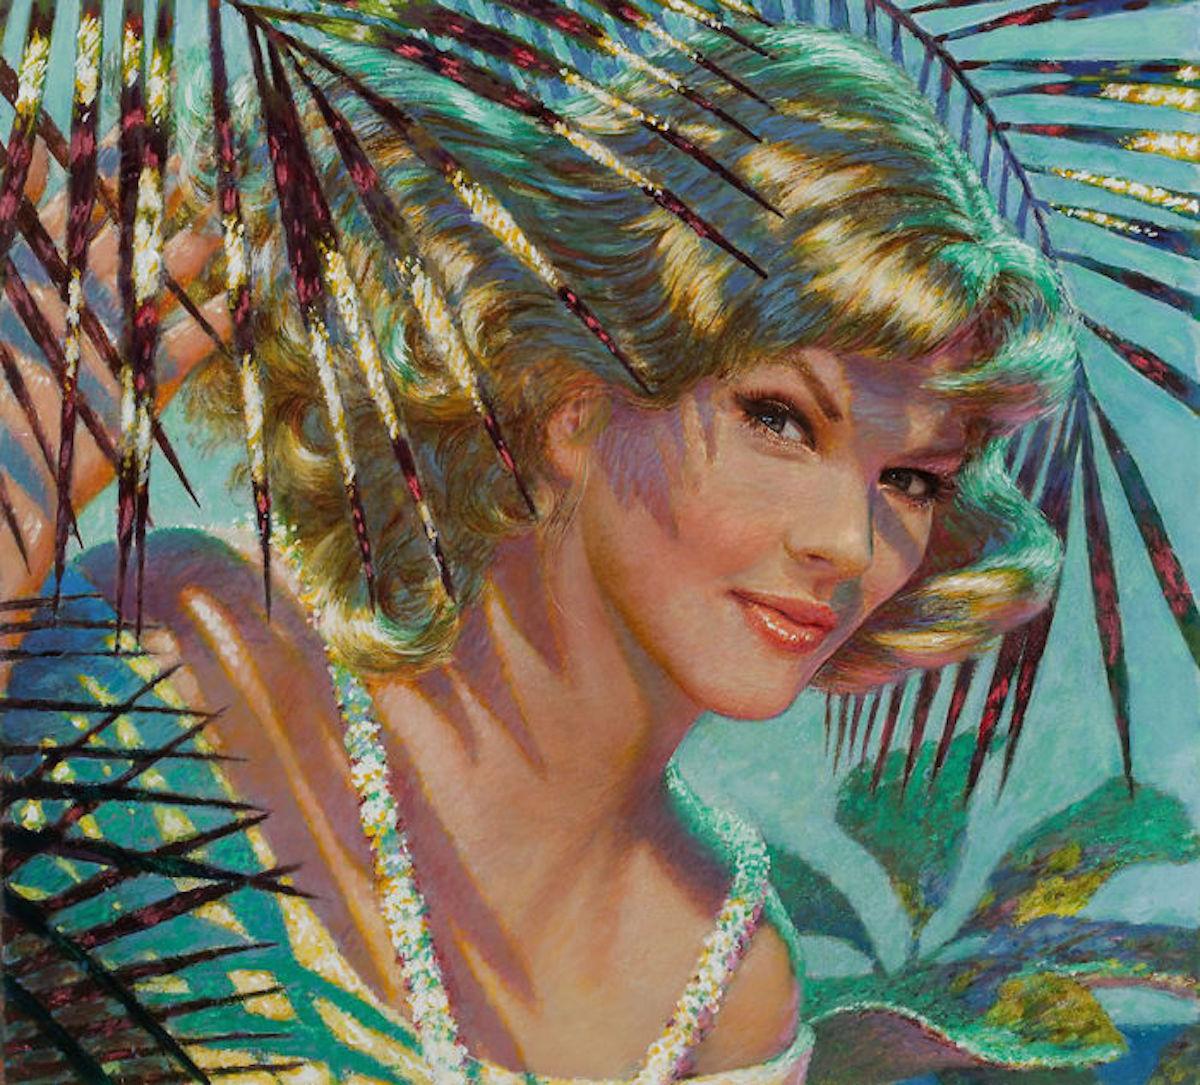 Taylor Swift Art Digital Design Crowd